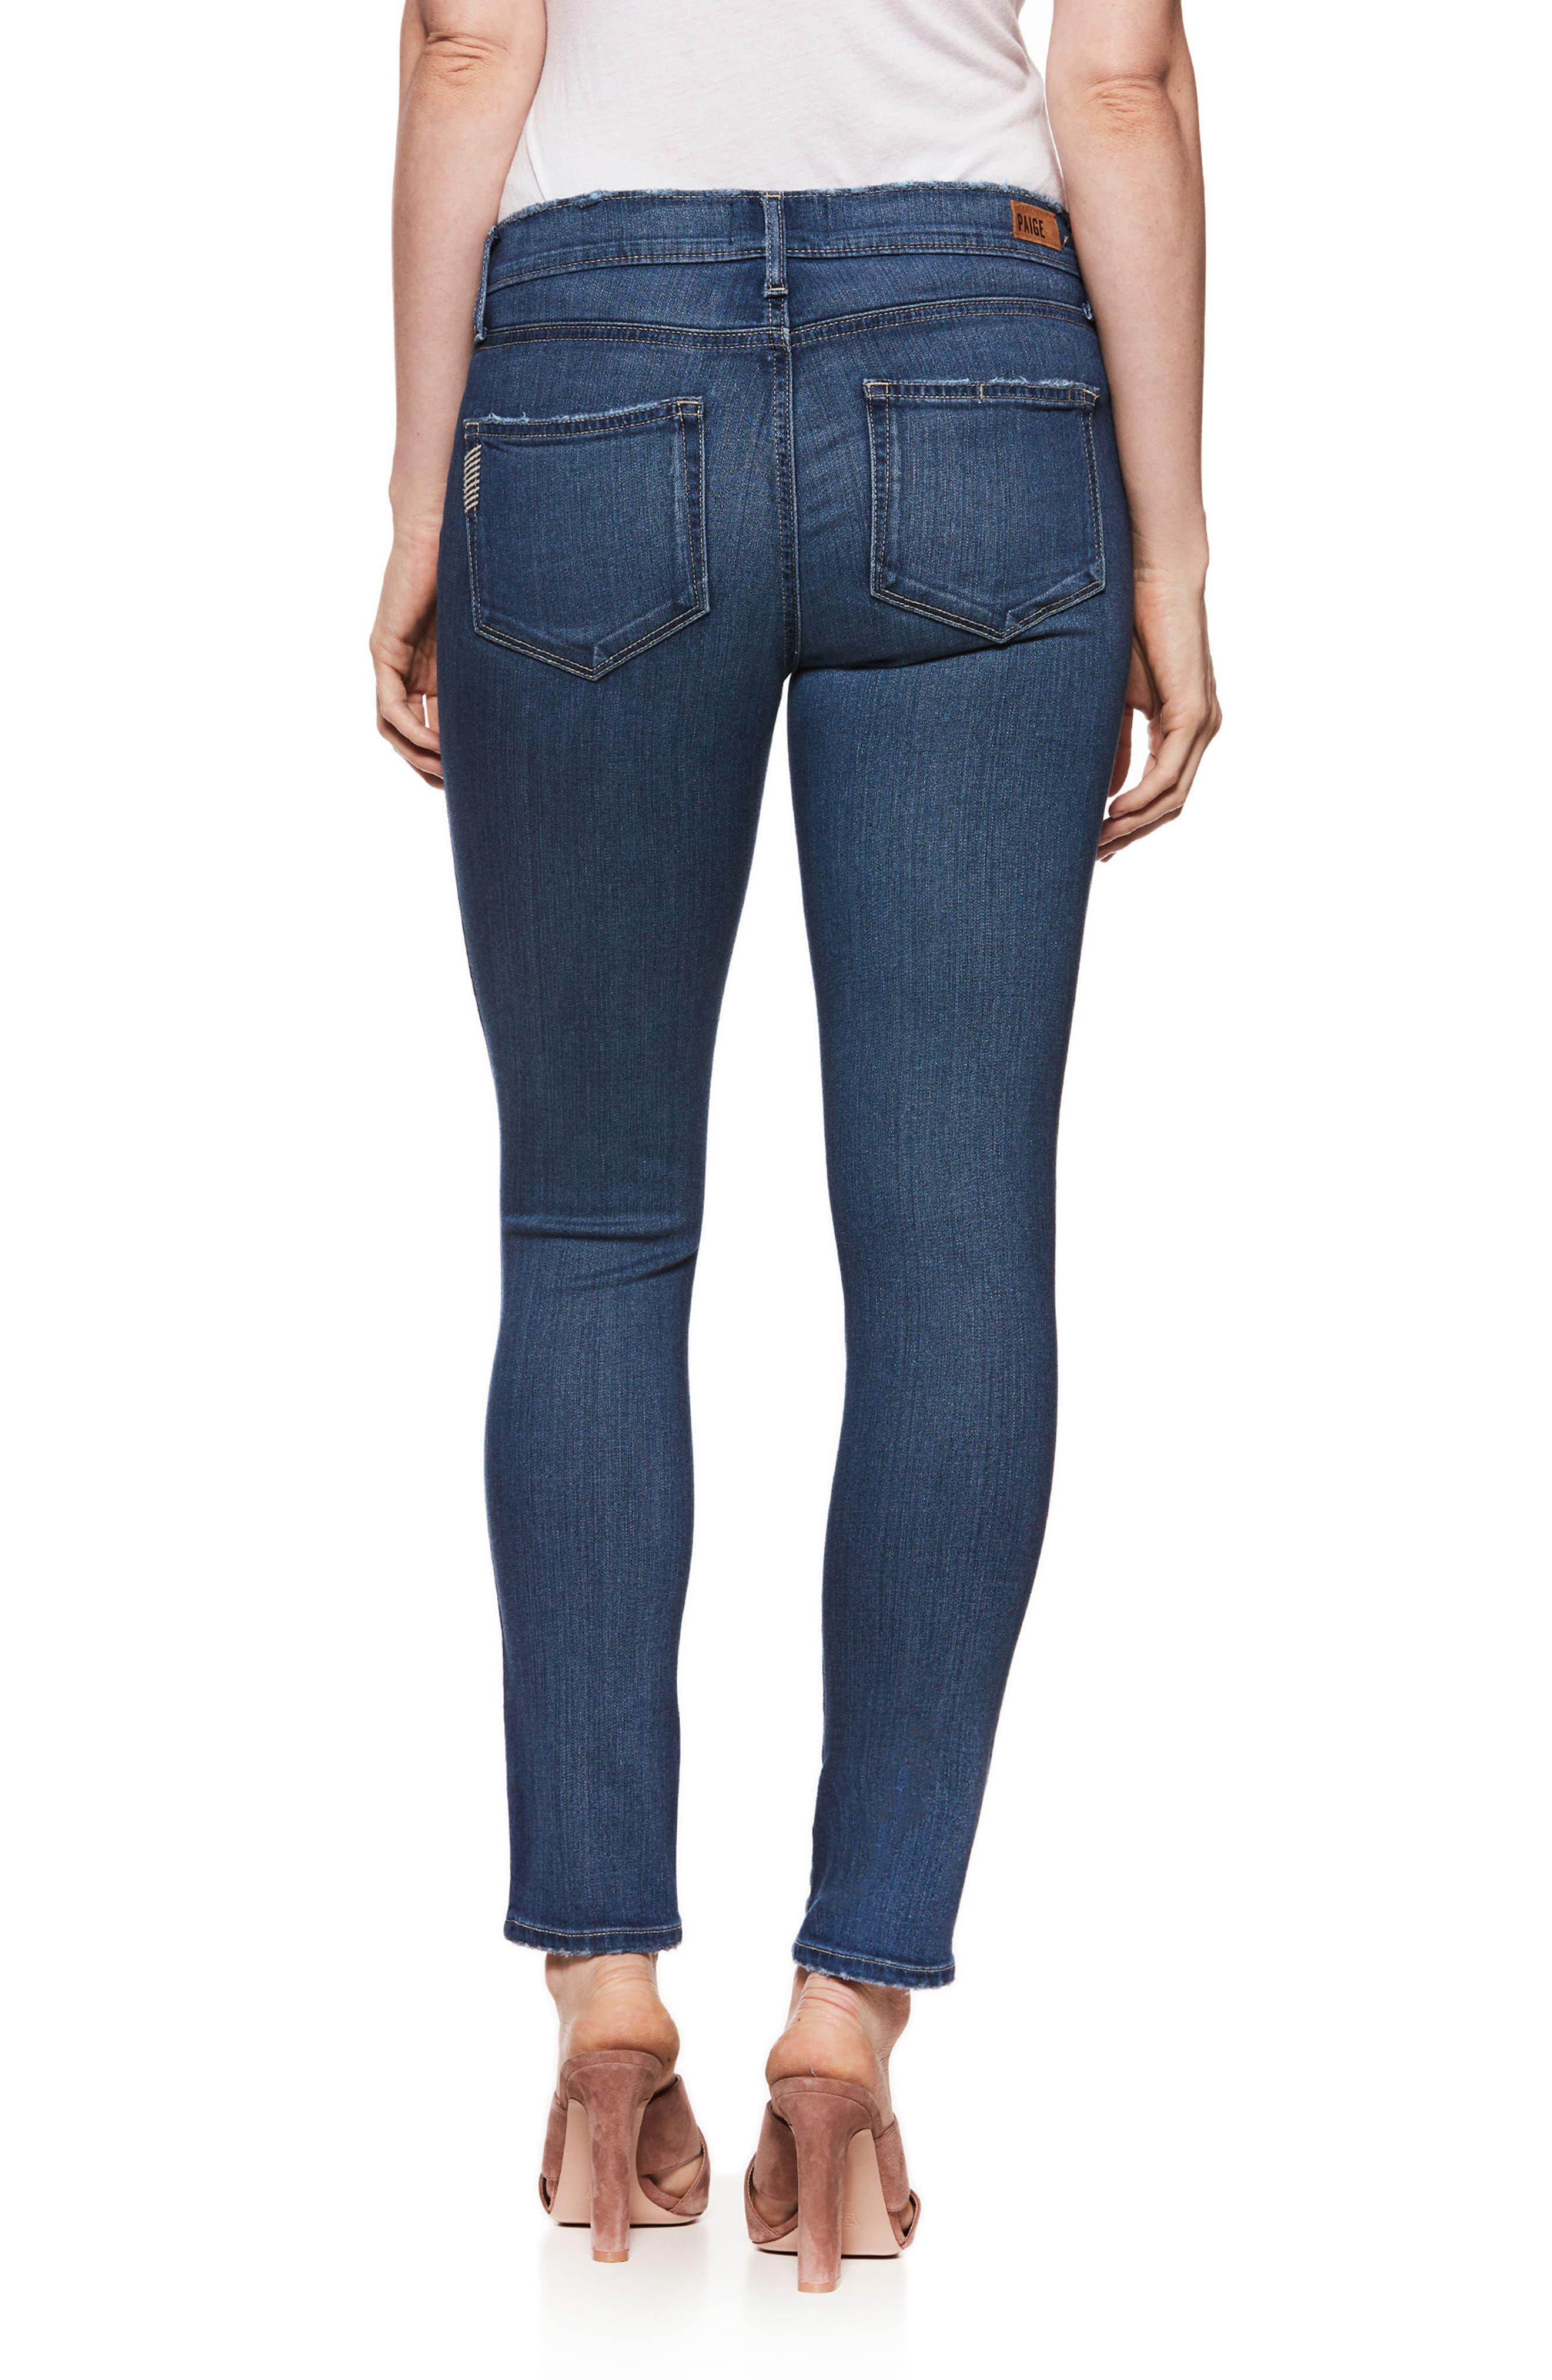 PAIGE,                             Transcend - Verdugo Ultra Skinny Maternity Jeans,                             Alternate thumbnail 2, color,                             400